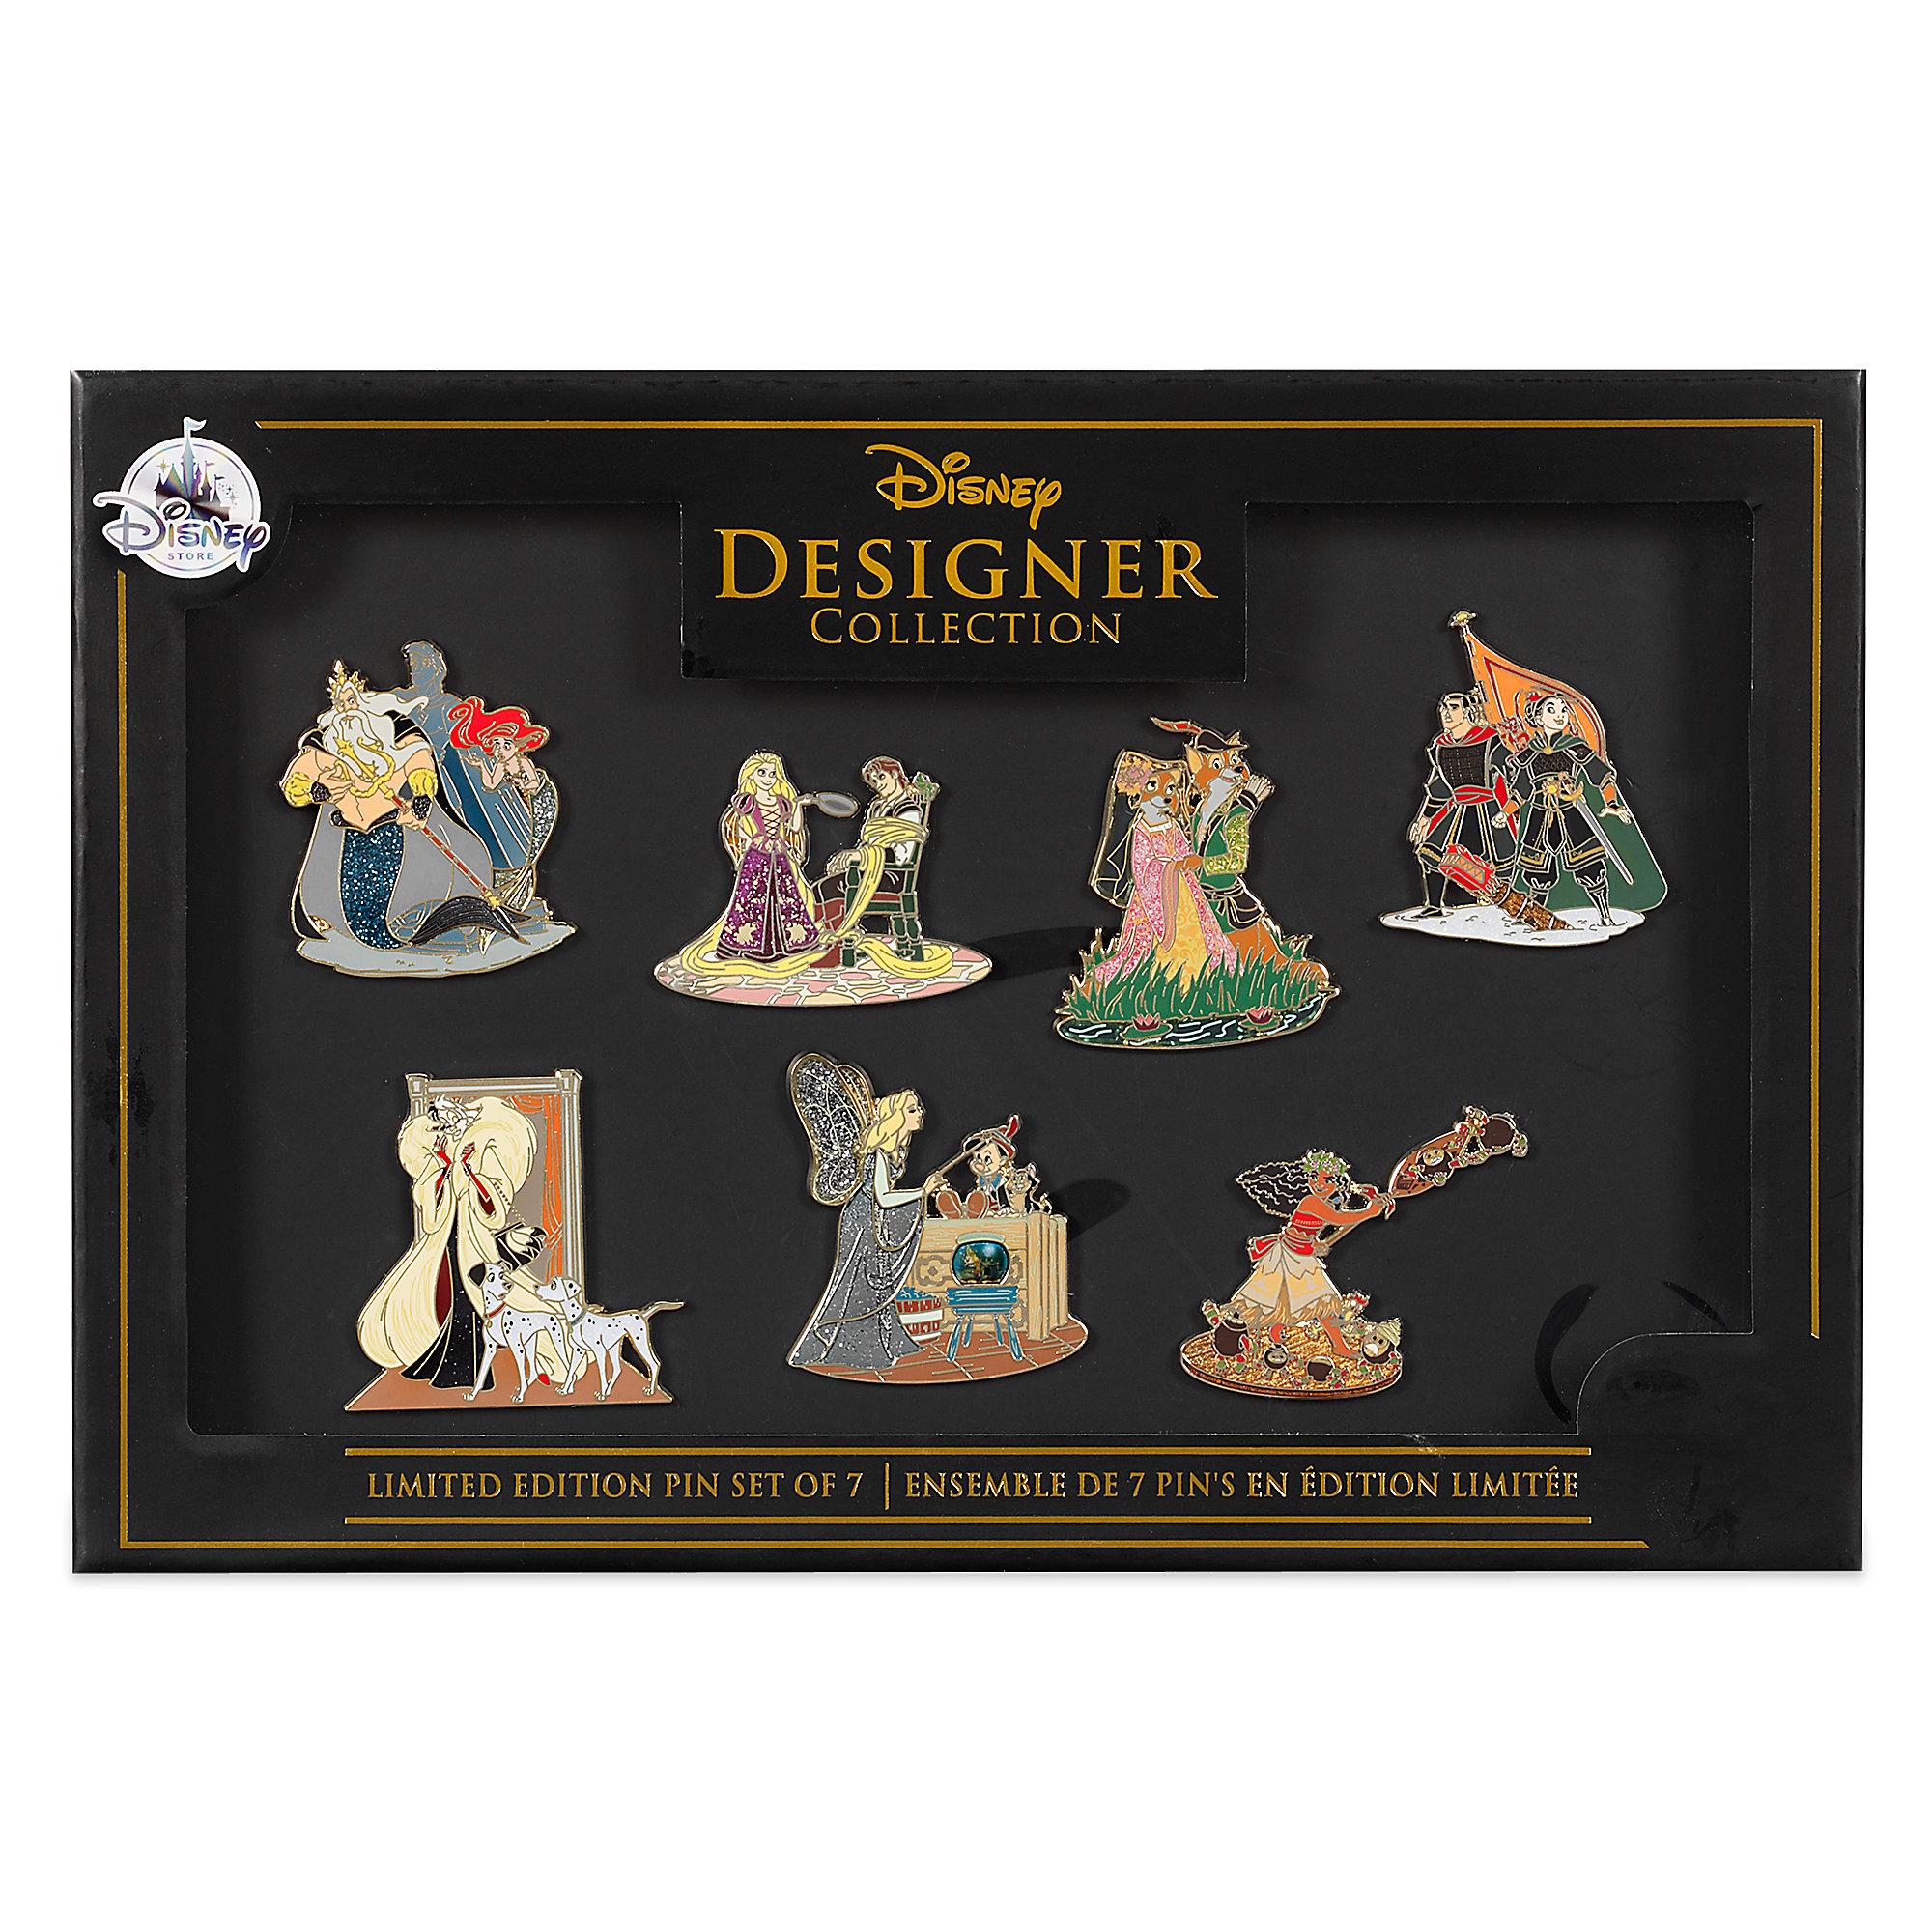 Disney Designer Collection Pin Set D23 Expo 2017 Disney Pins Blog